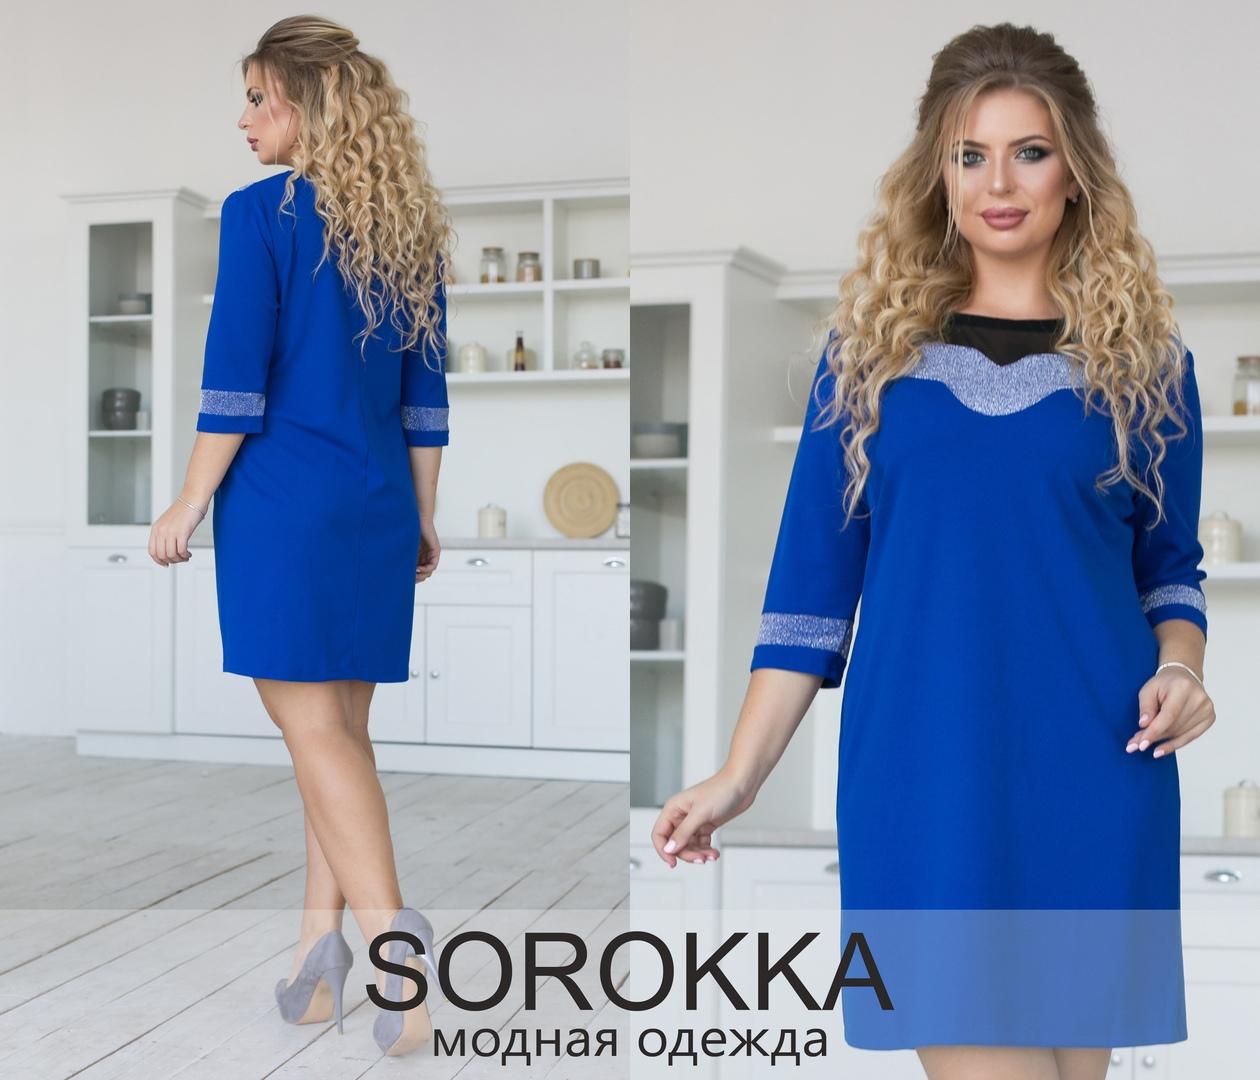 07e1d9557950 Платье ХЛ 2018 2019 Платье 9 мод № 626 2886495 - Babyblog.ru